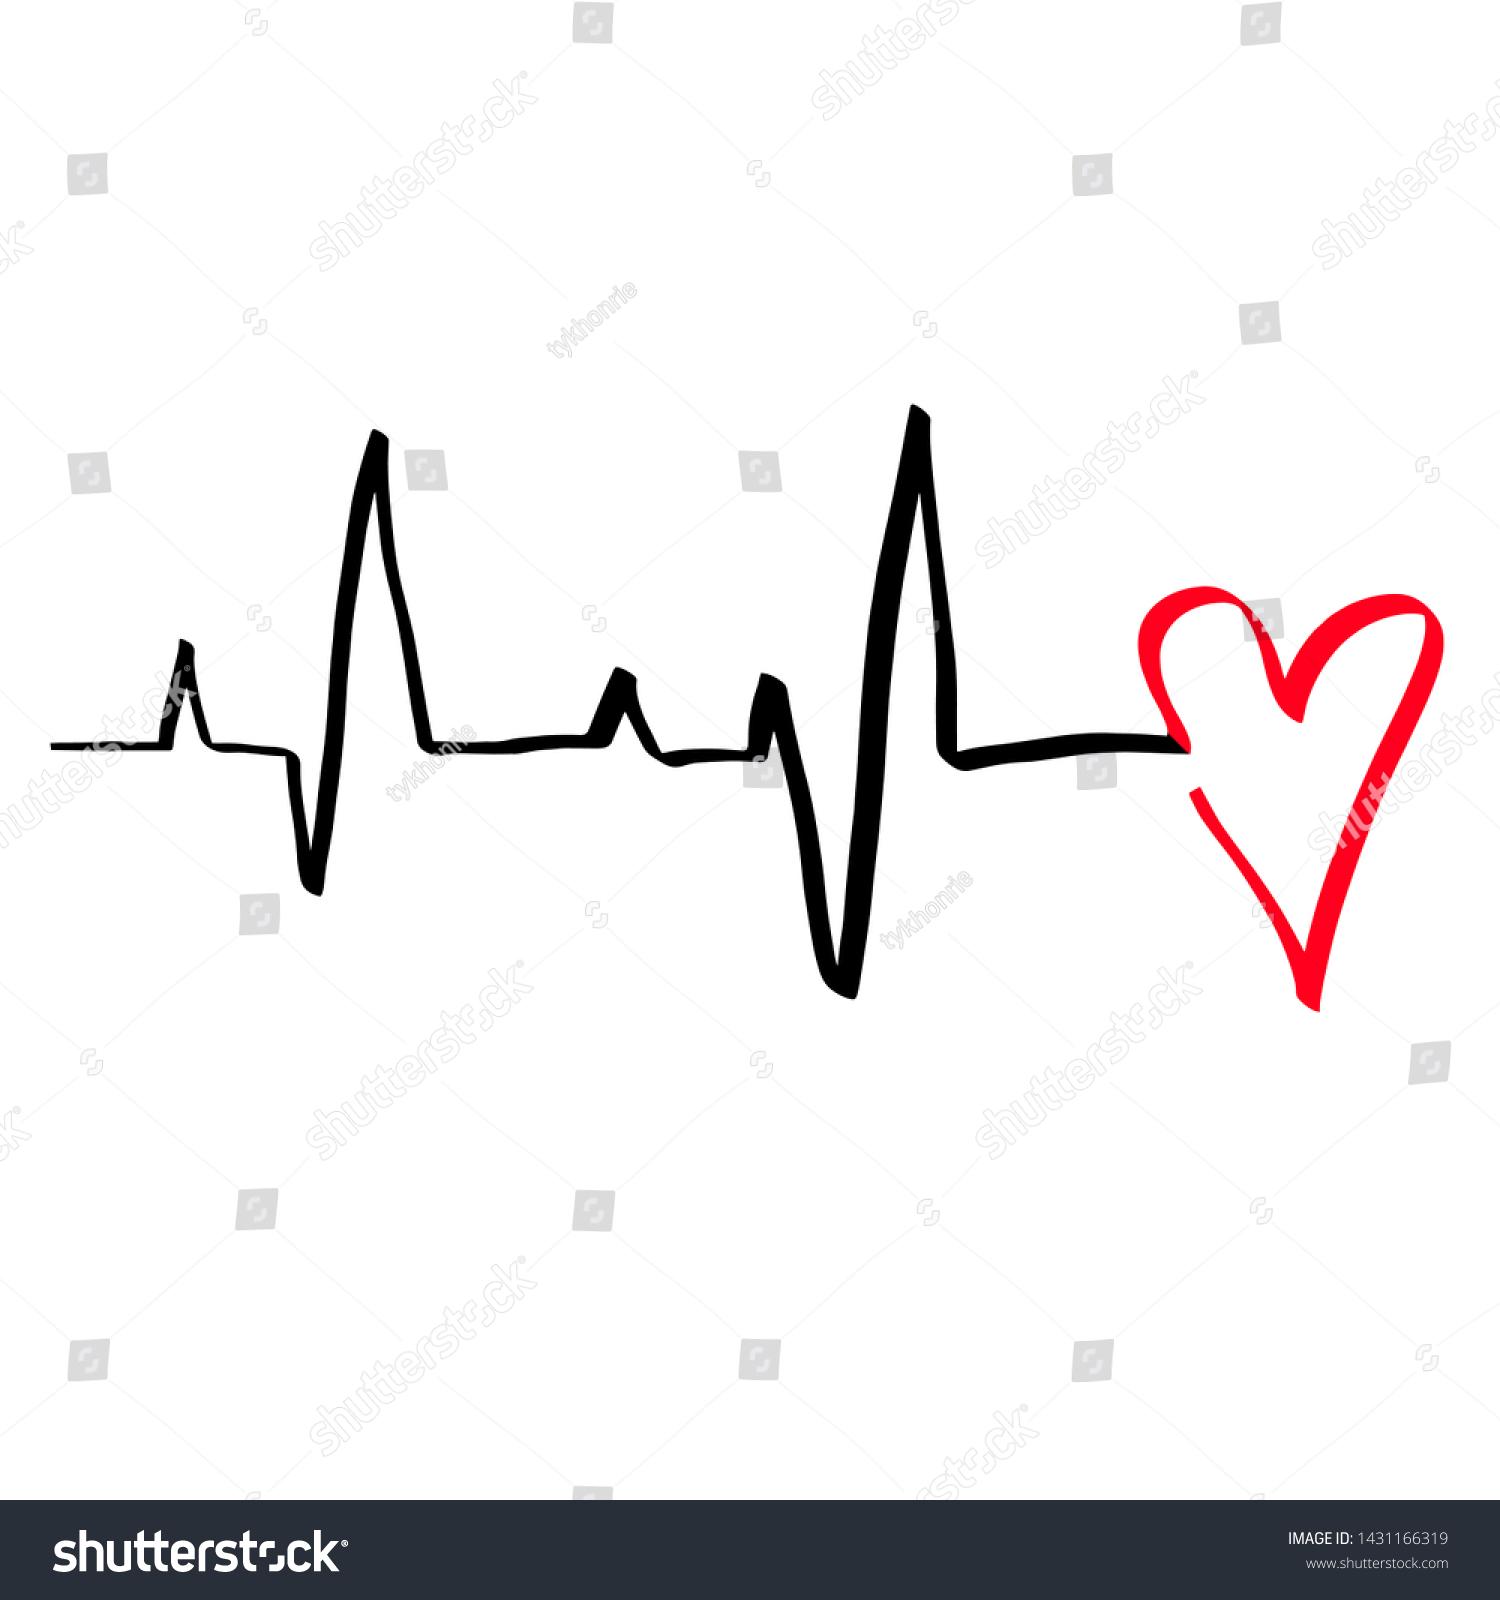 stock-vector-black-red-heart-cardiogram-